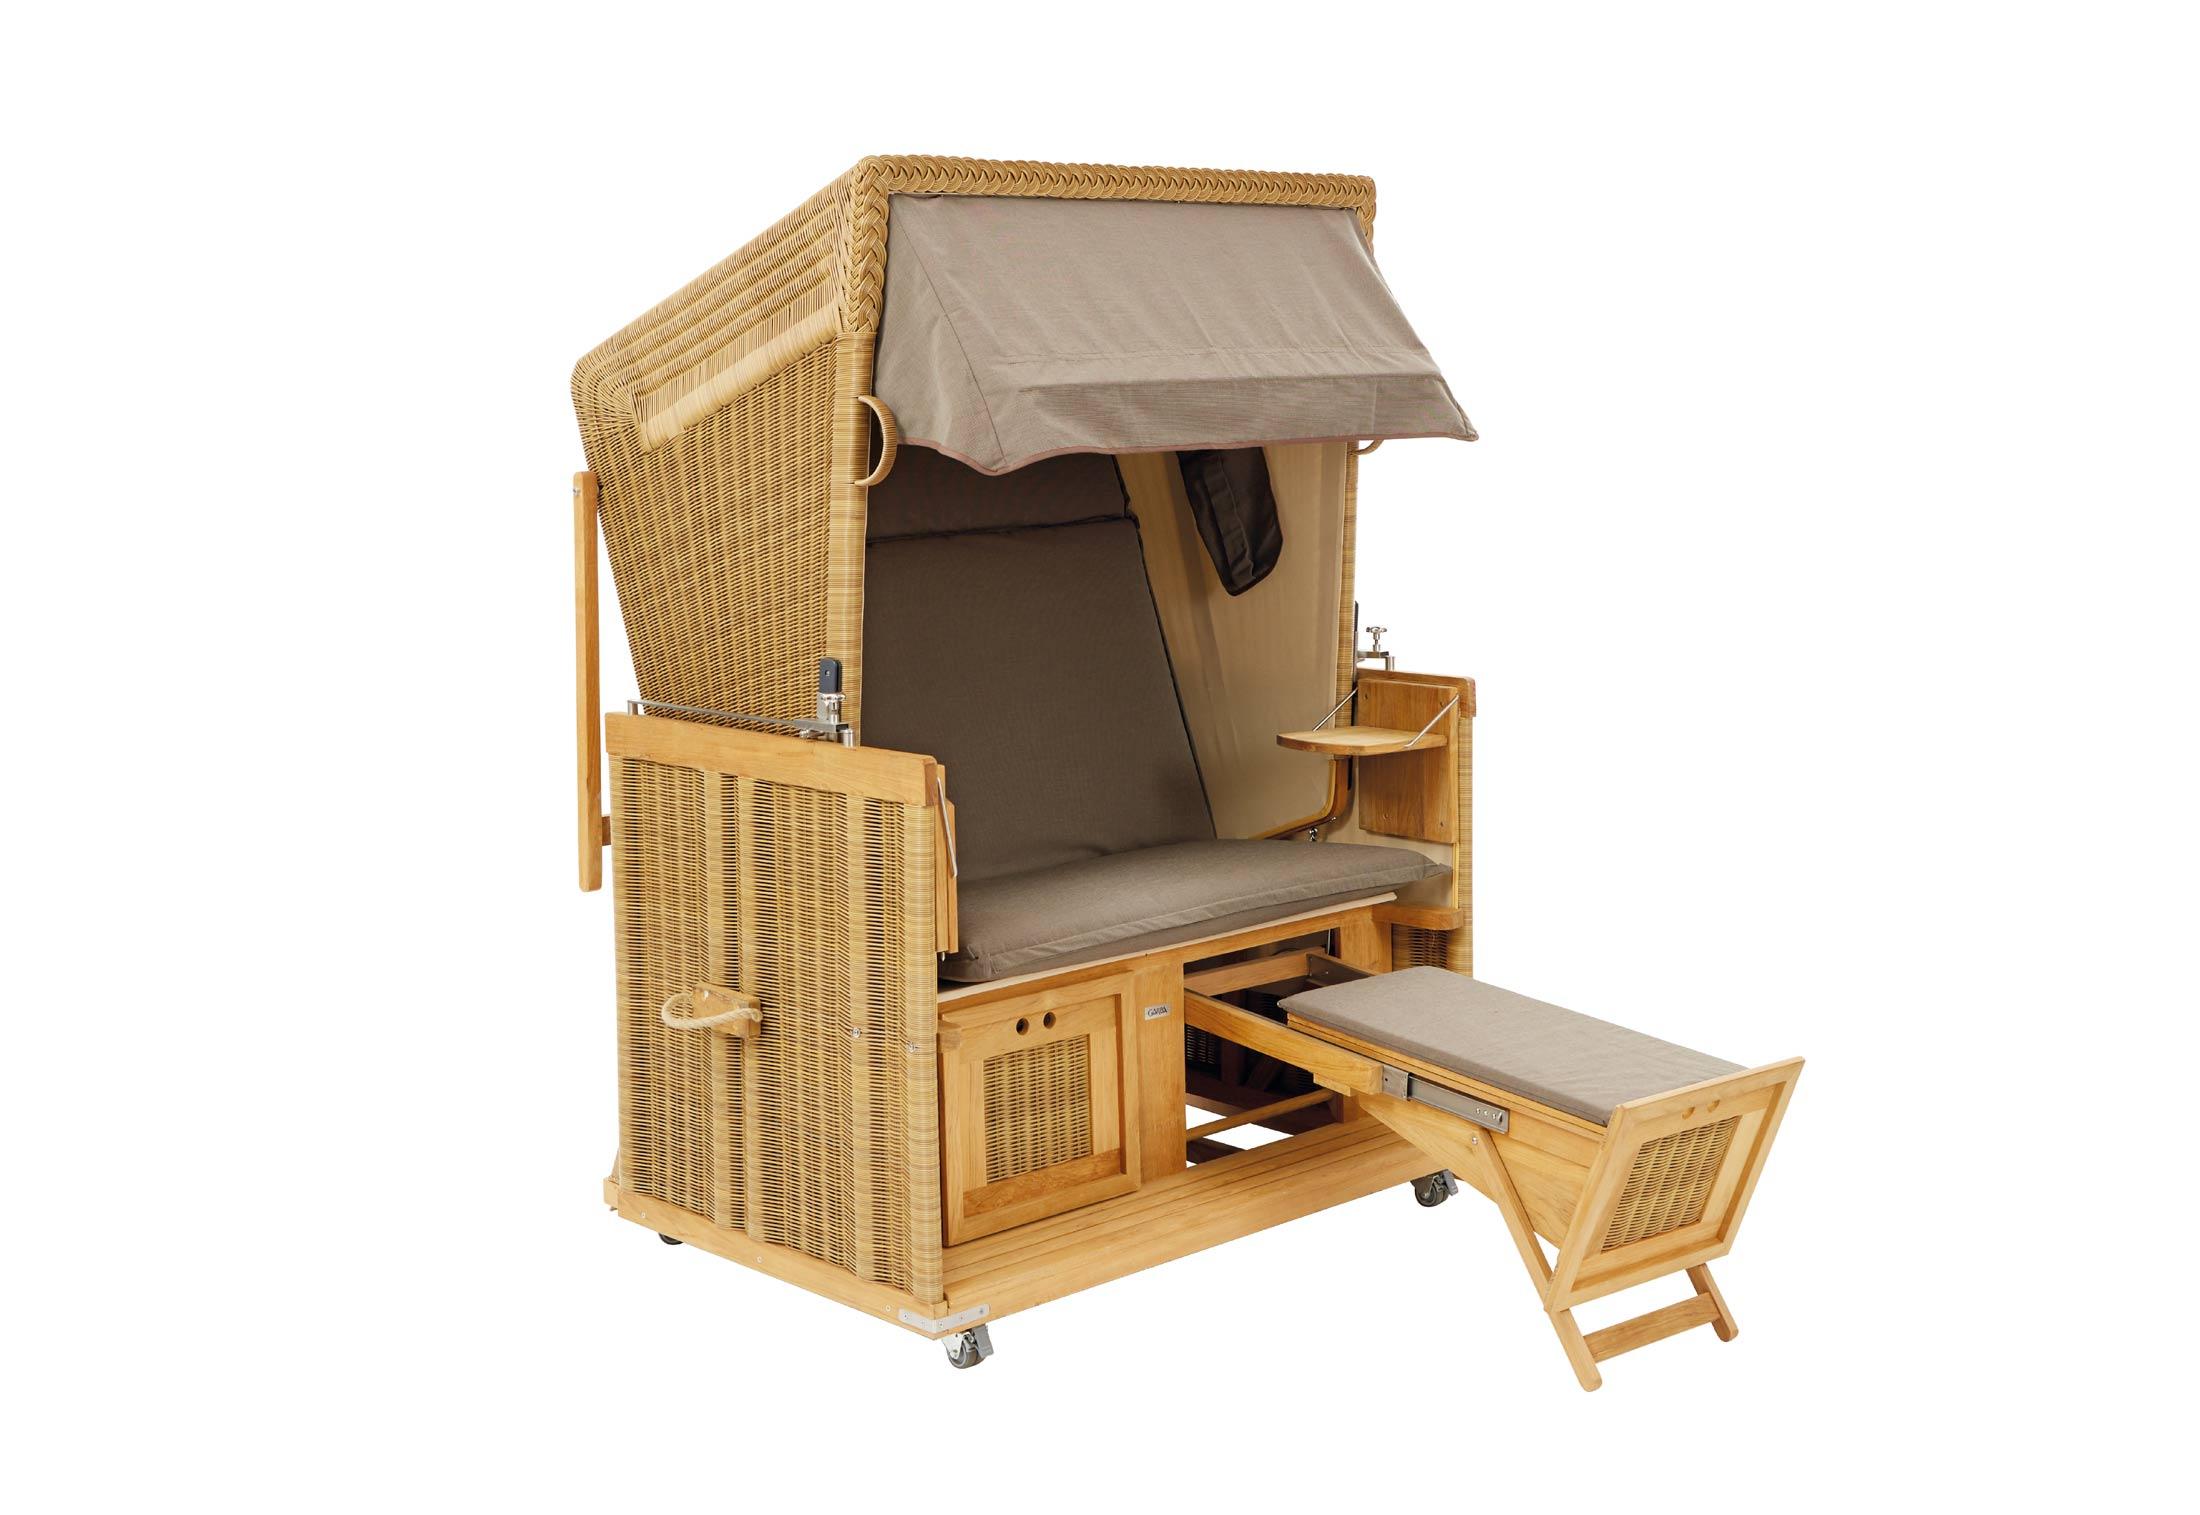 strandkorb maroon von garpa stylepark. Black Bedroom Furniture Sets. Home Design Ideas